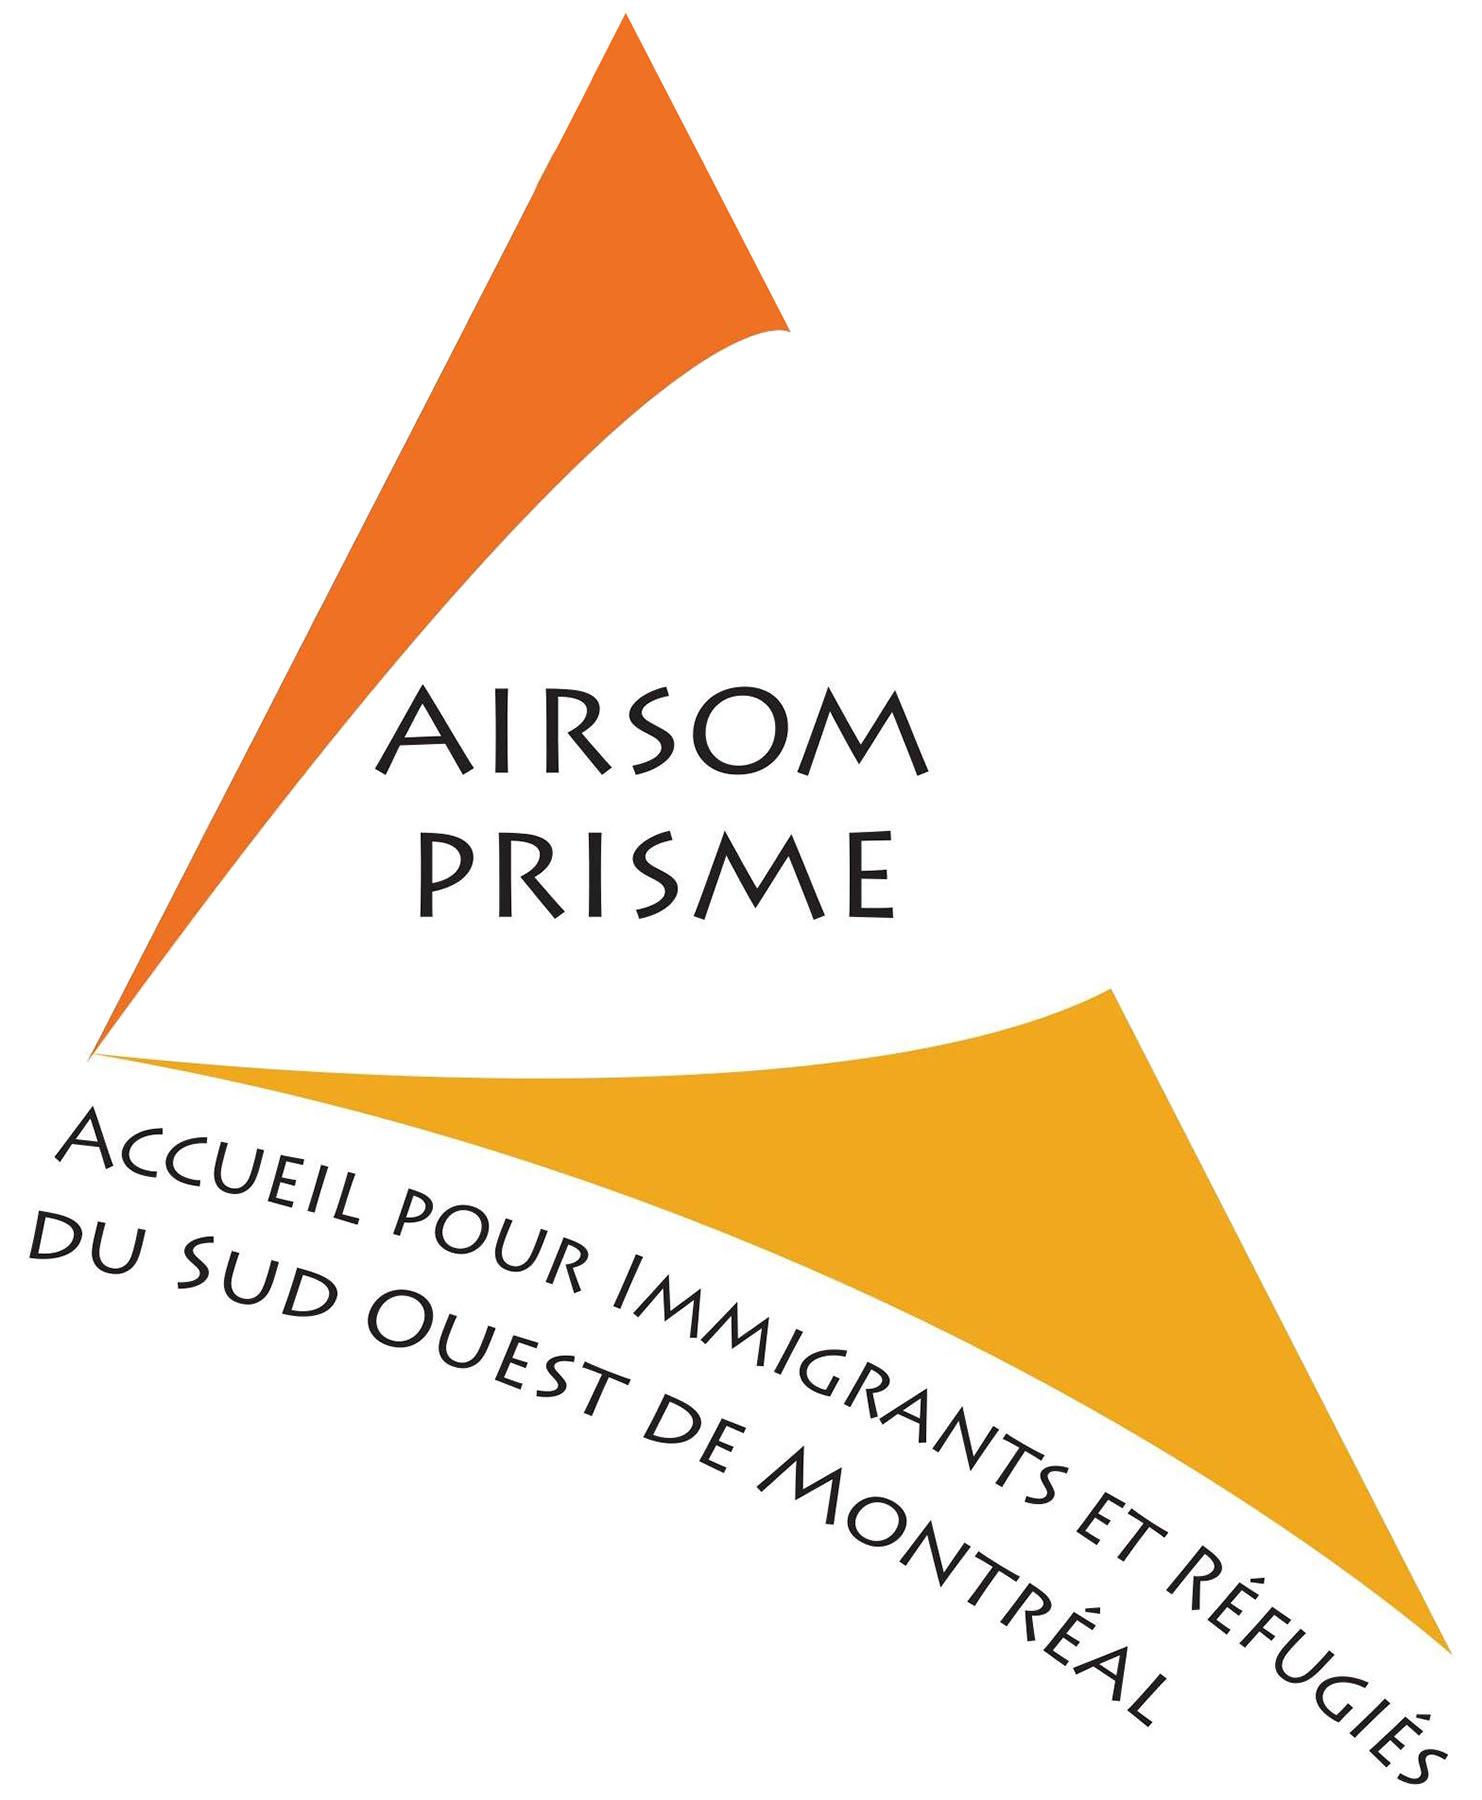 AIRSOM-PRISME